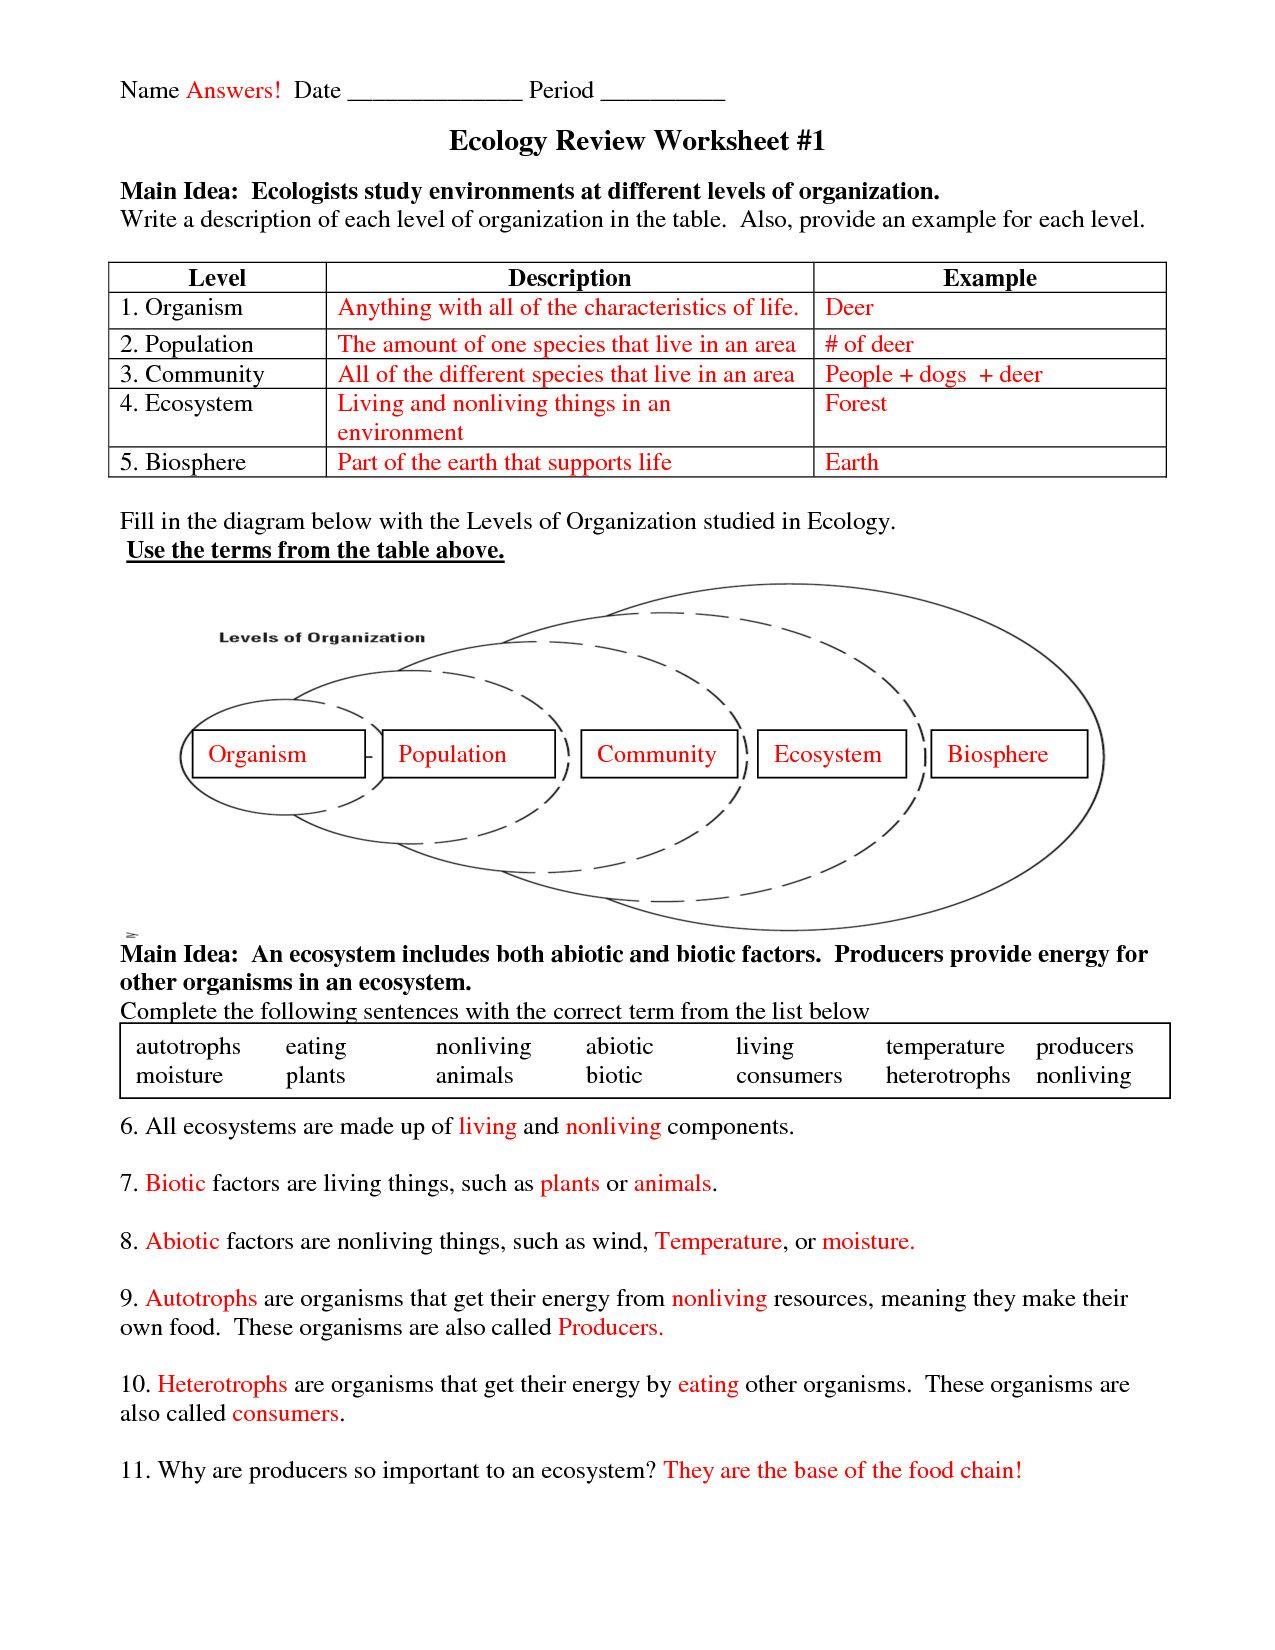 OfficialGeneral Ecology Review Worksheet Science